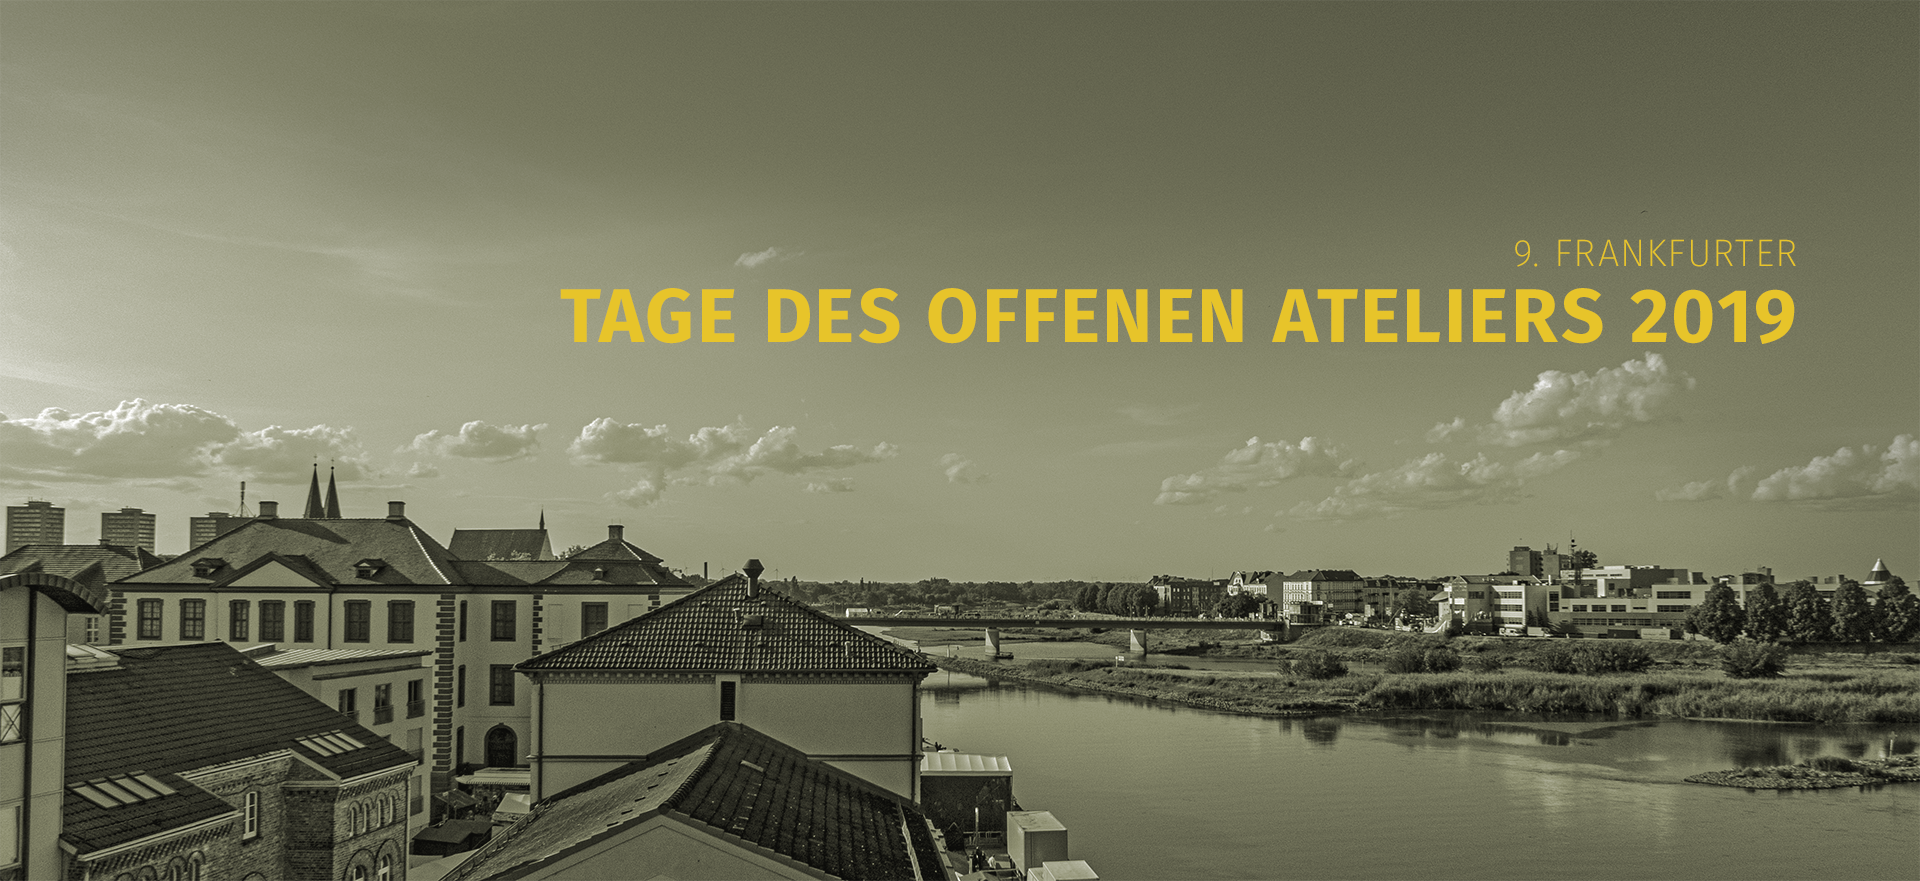 Offene Ateliers Frankfurt (Oder)